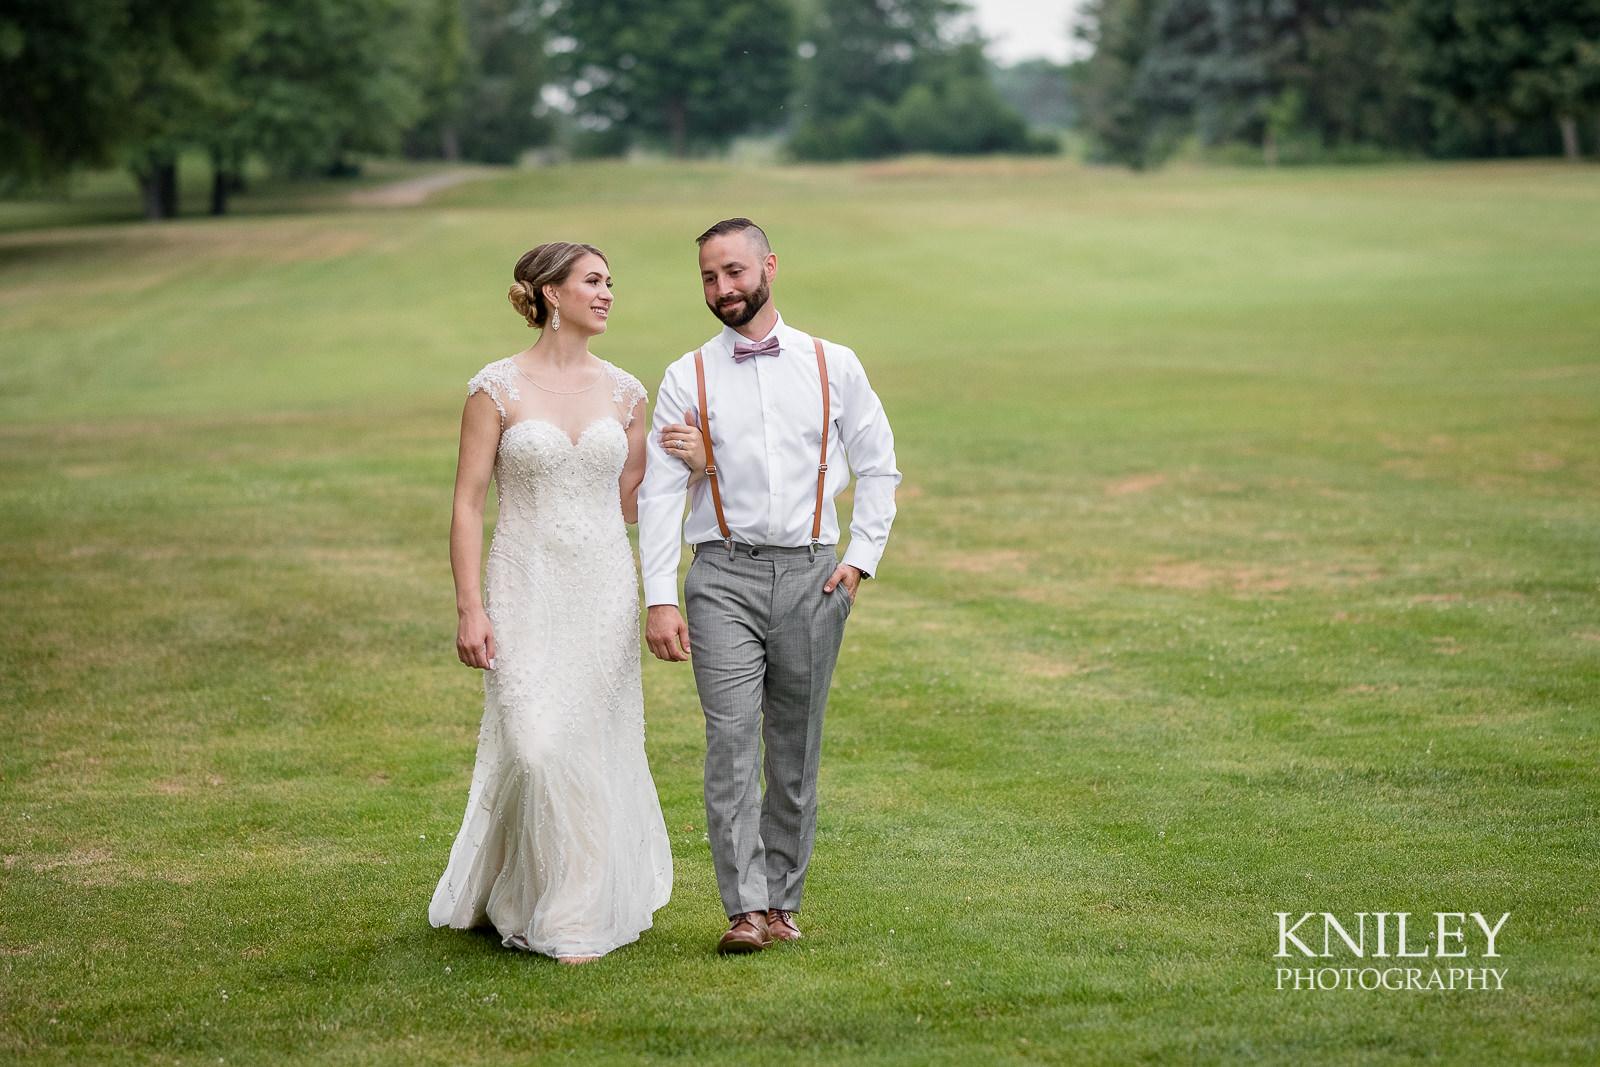 093 - Ontario Golf Club Wedding Pictures - XT2B9146.jpg